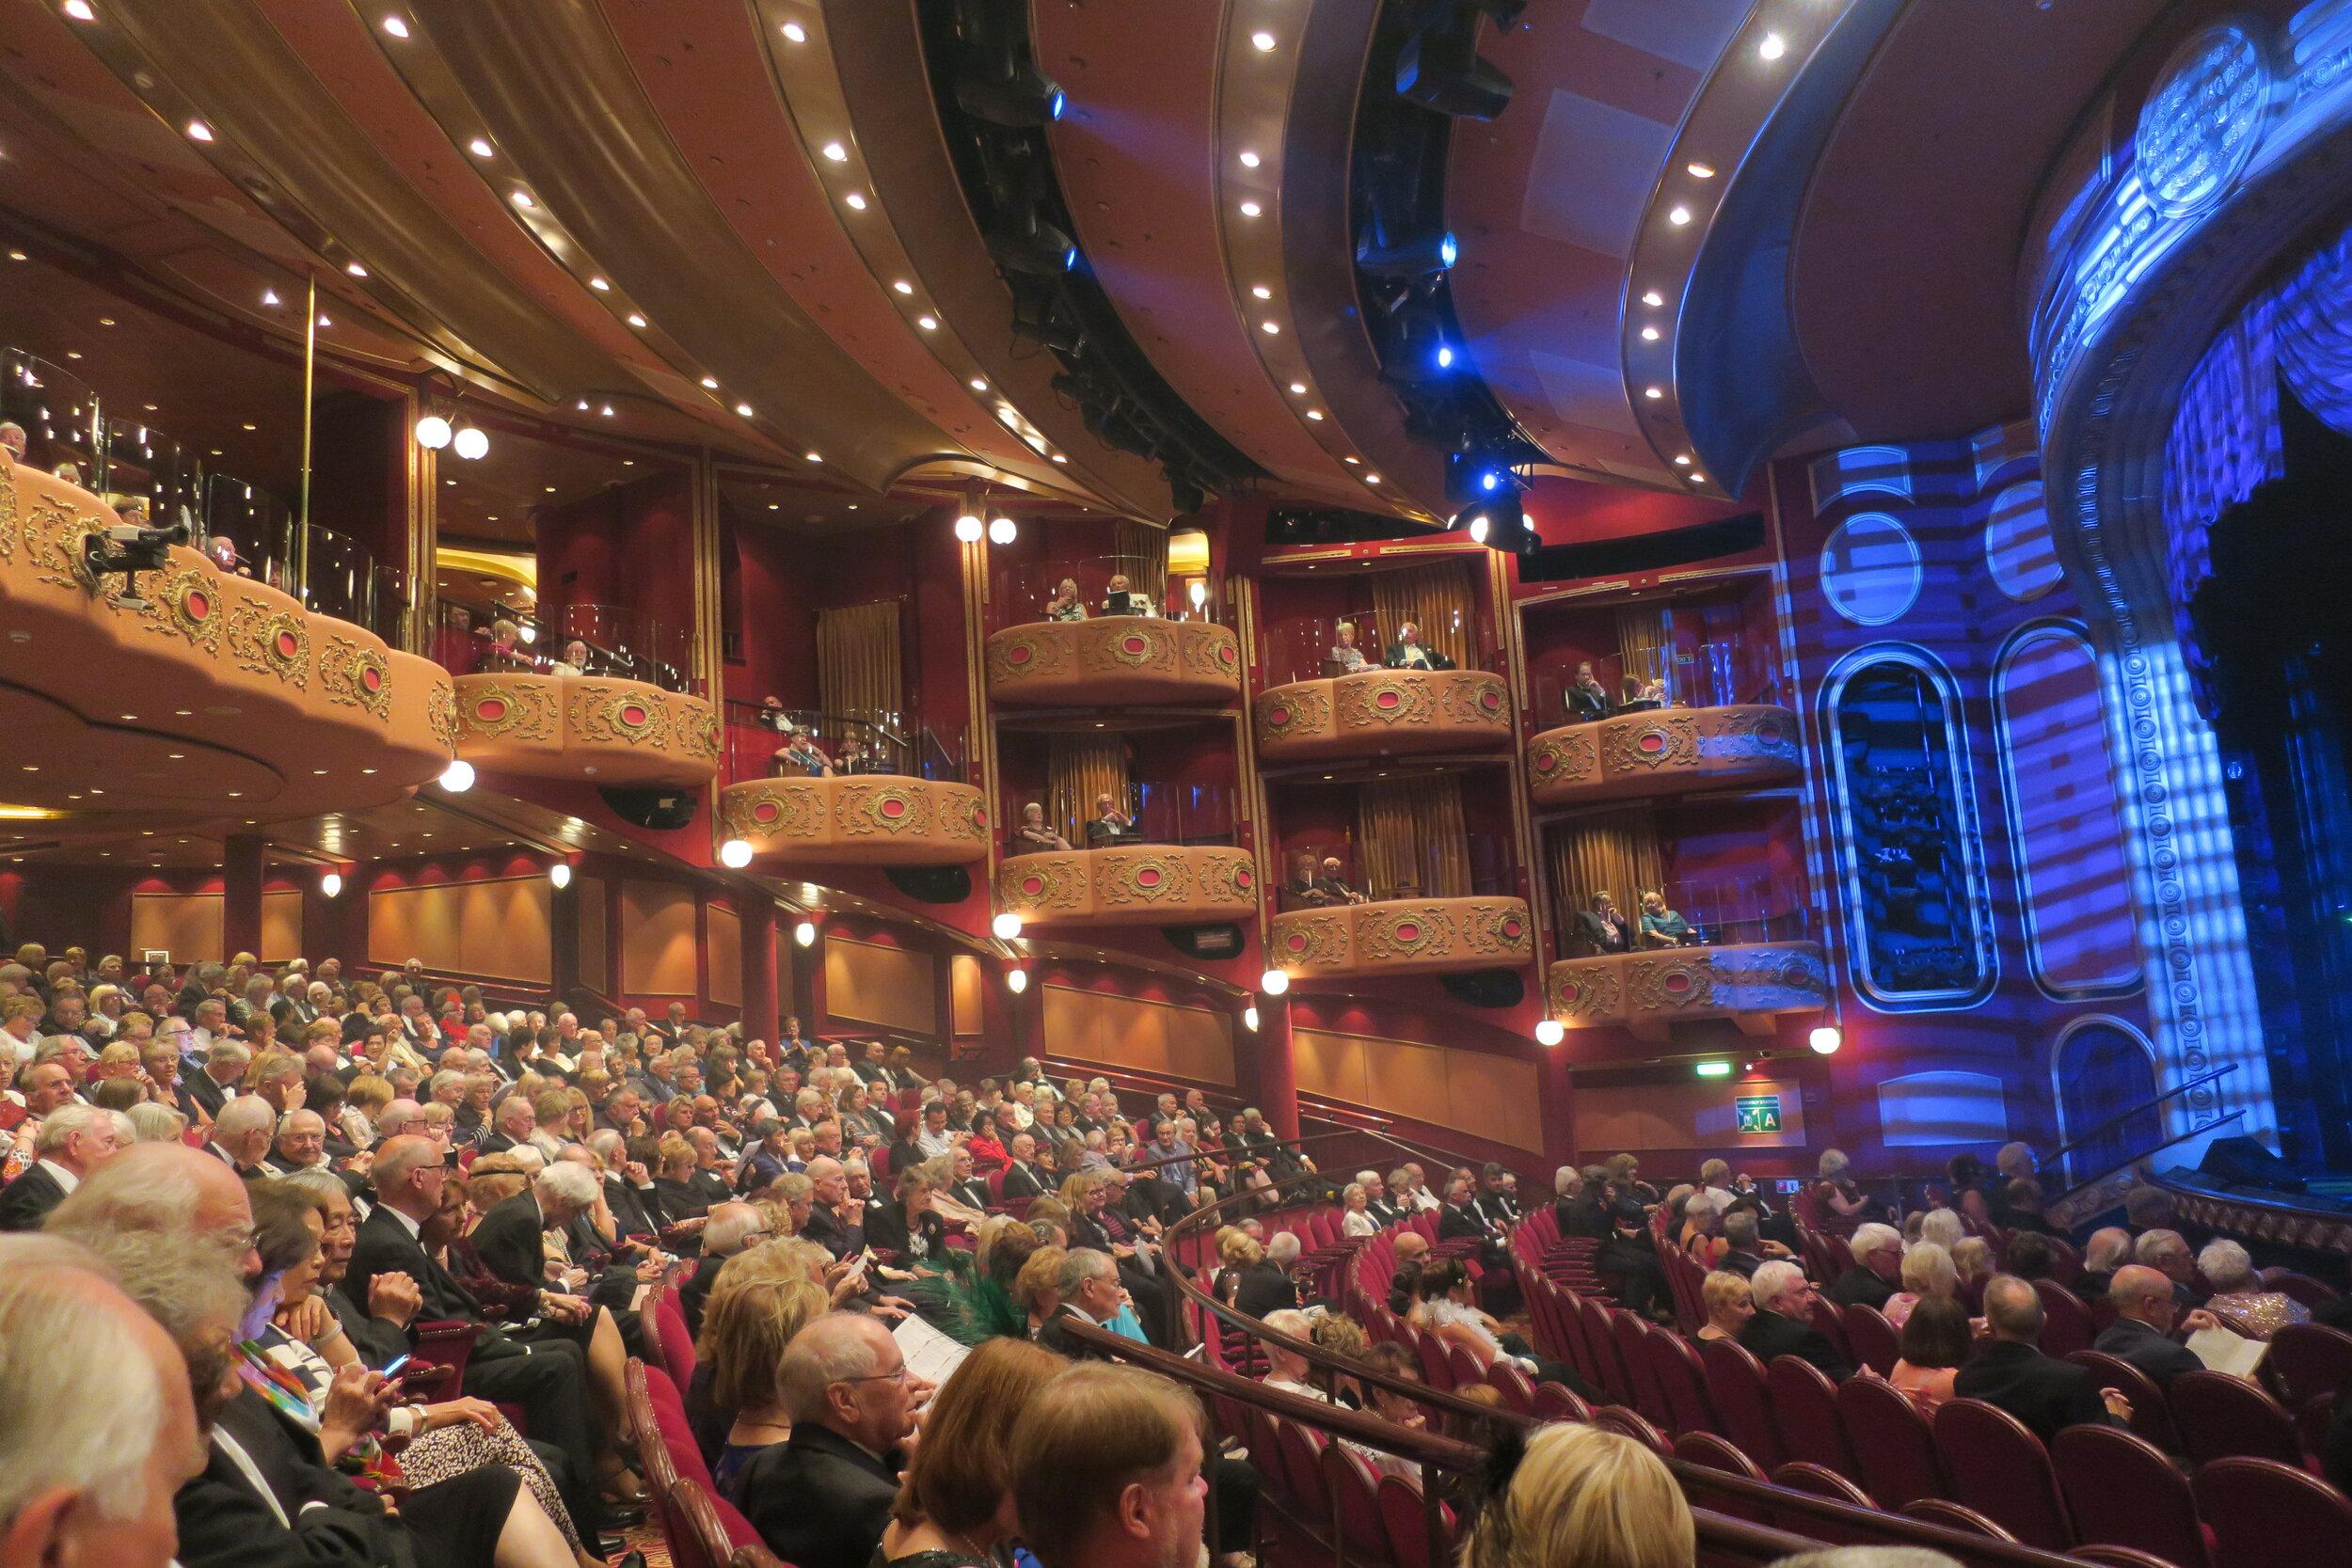 Theatre. 16 Boxes